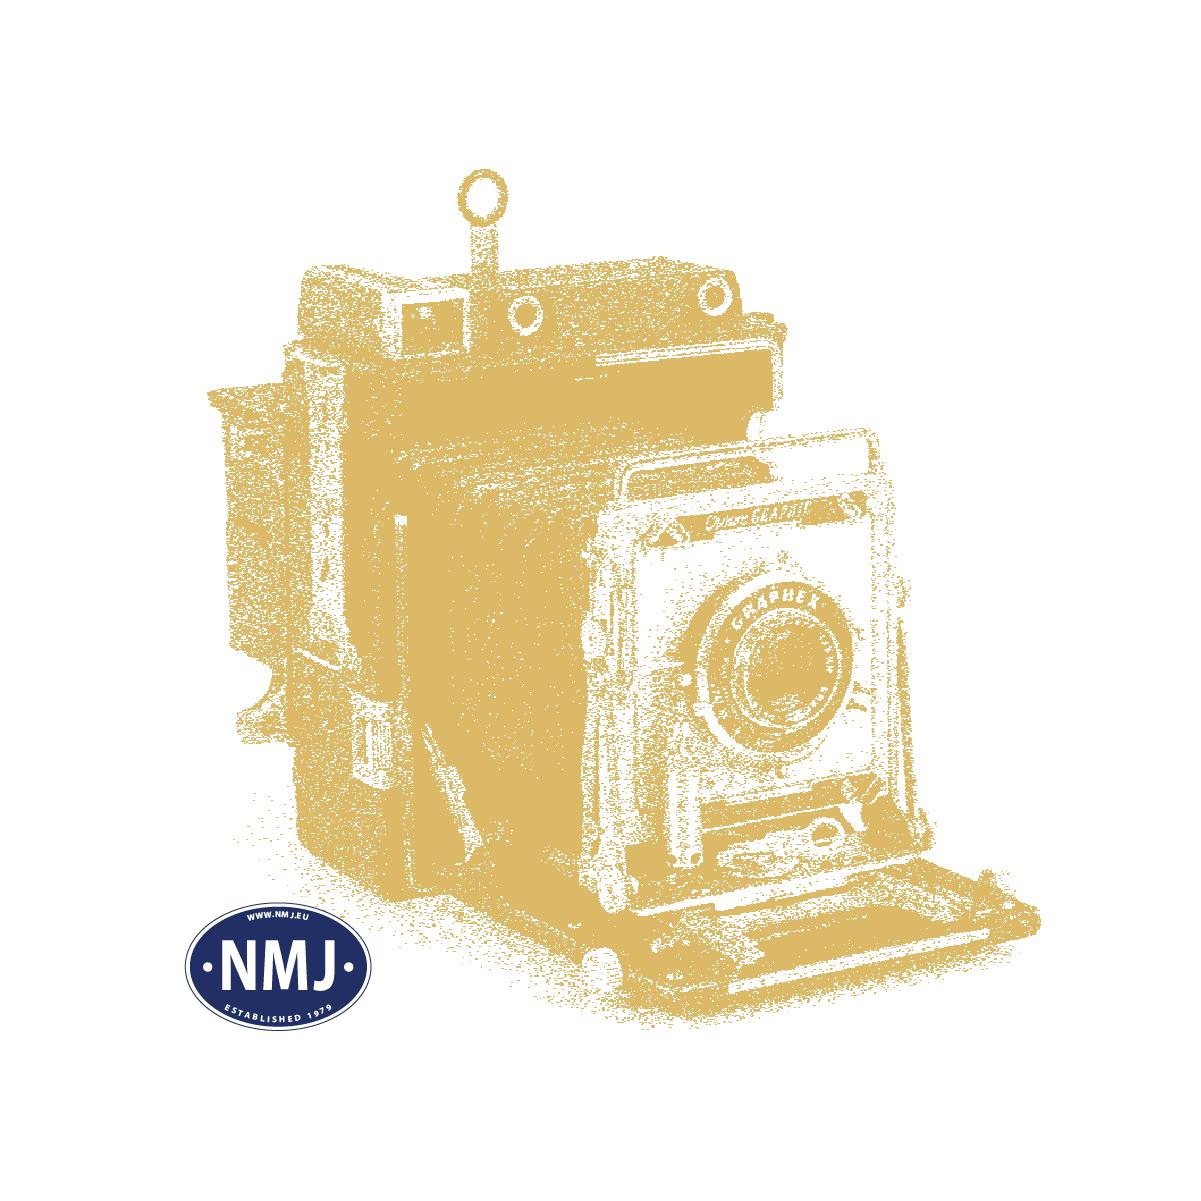 NOC15281 - Lokførere, Damplok